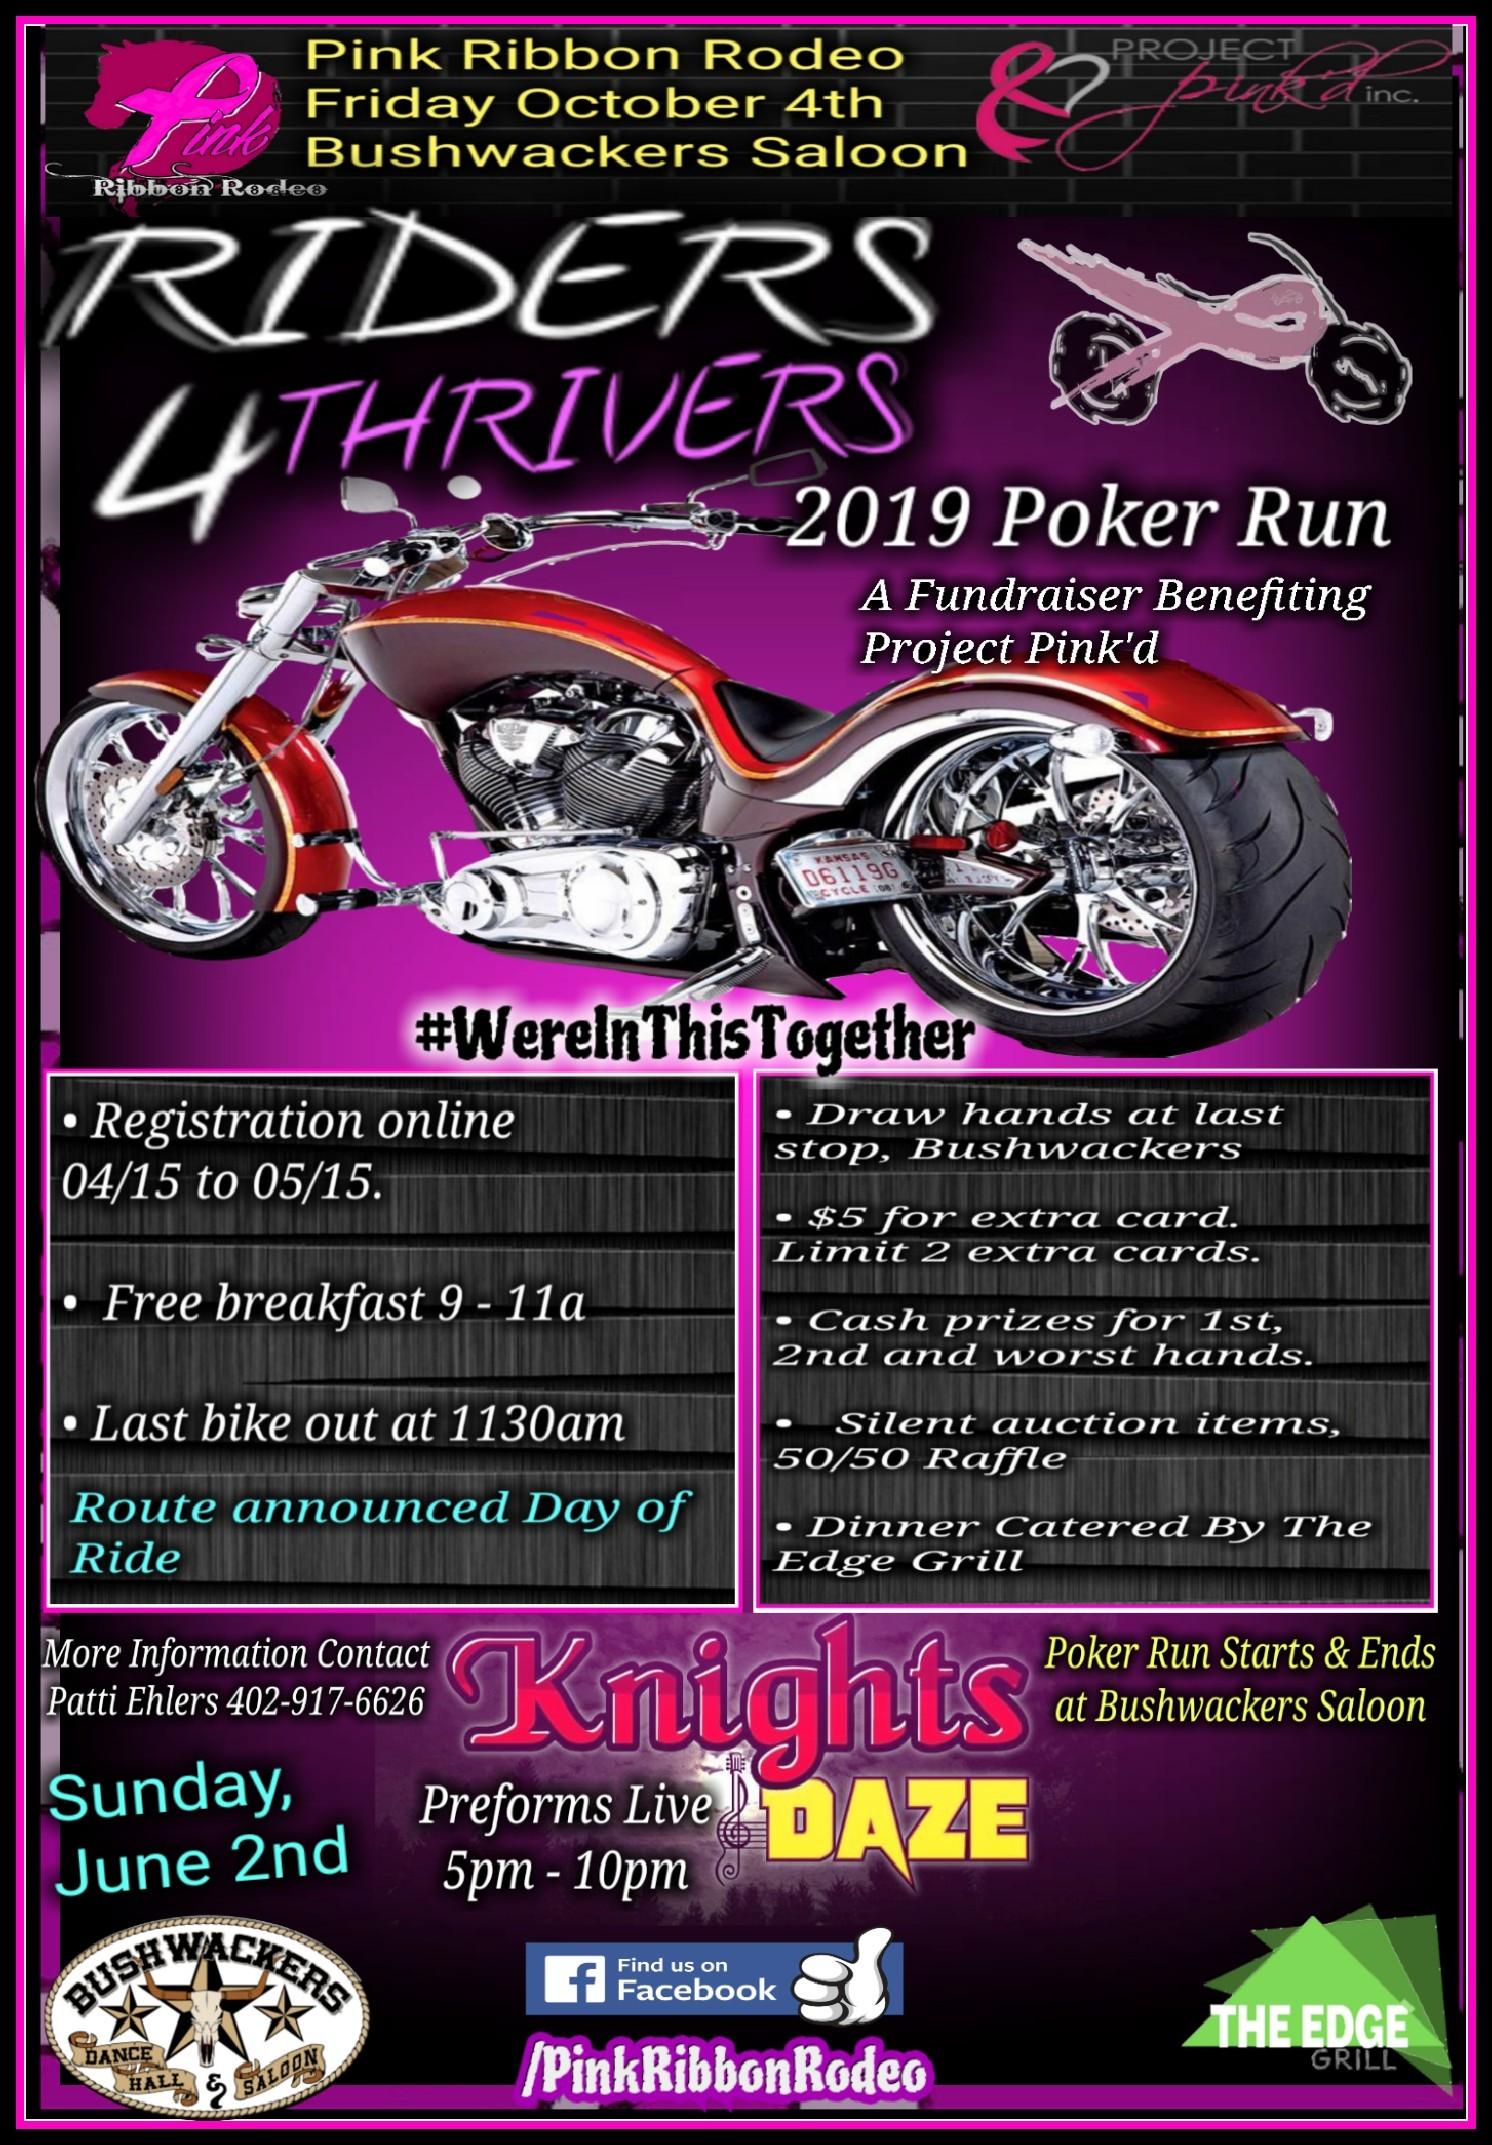 Pink Ribbon Rodeo Poker Run